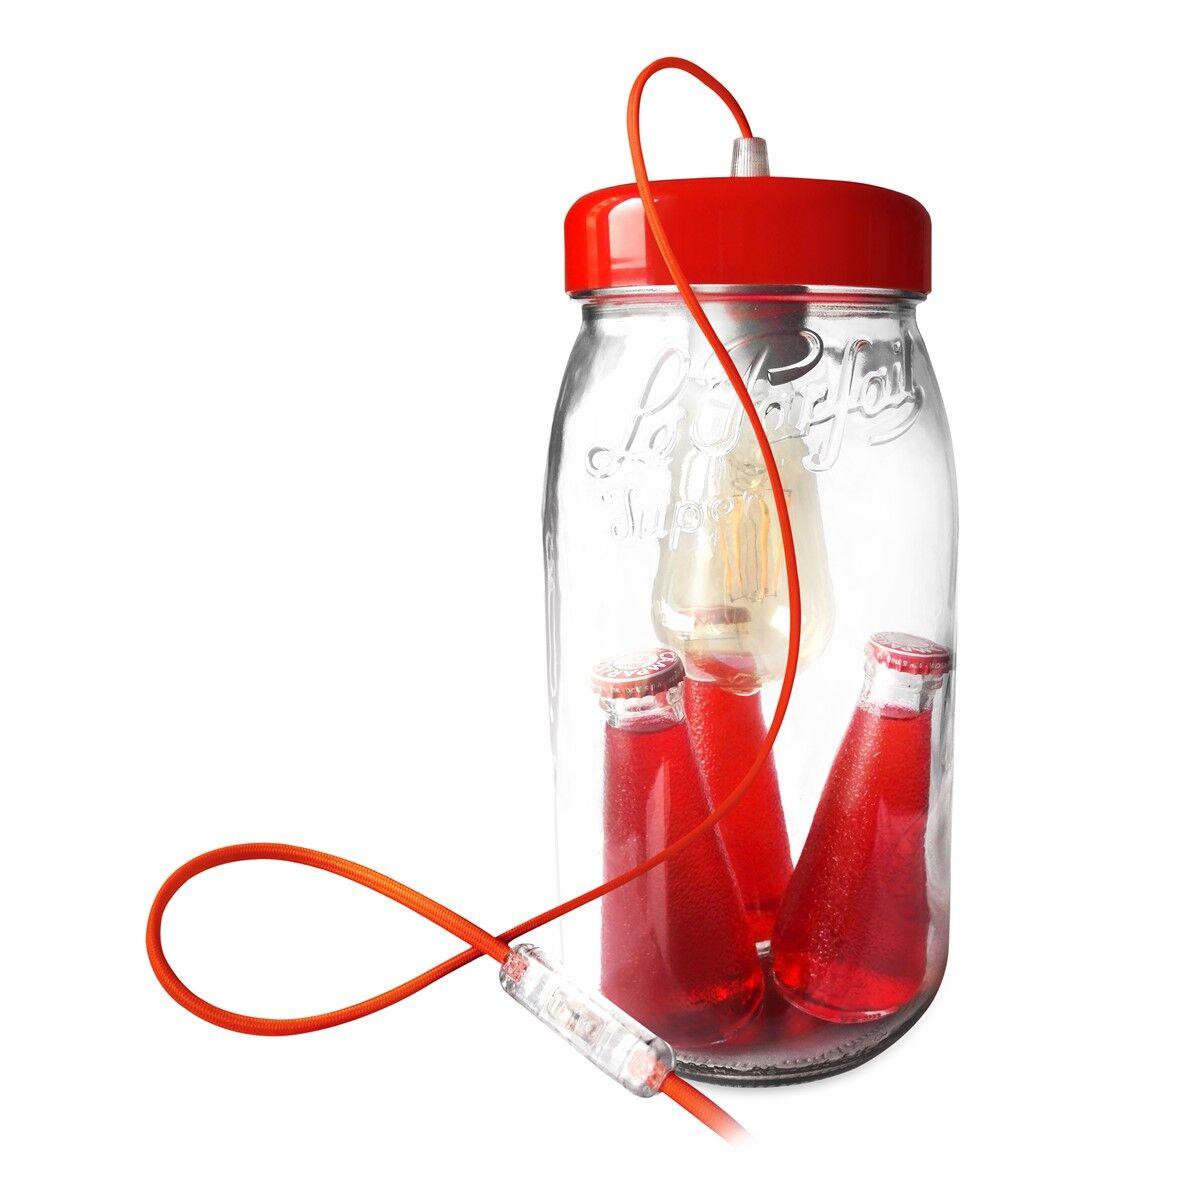 Fenel & Arno Lampe bocal en verre rouge